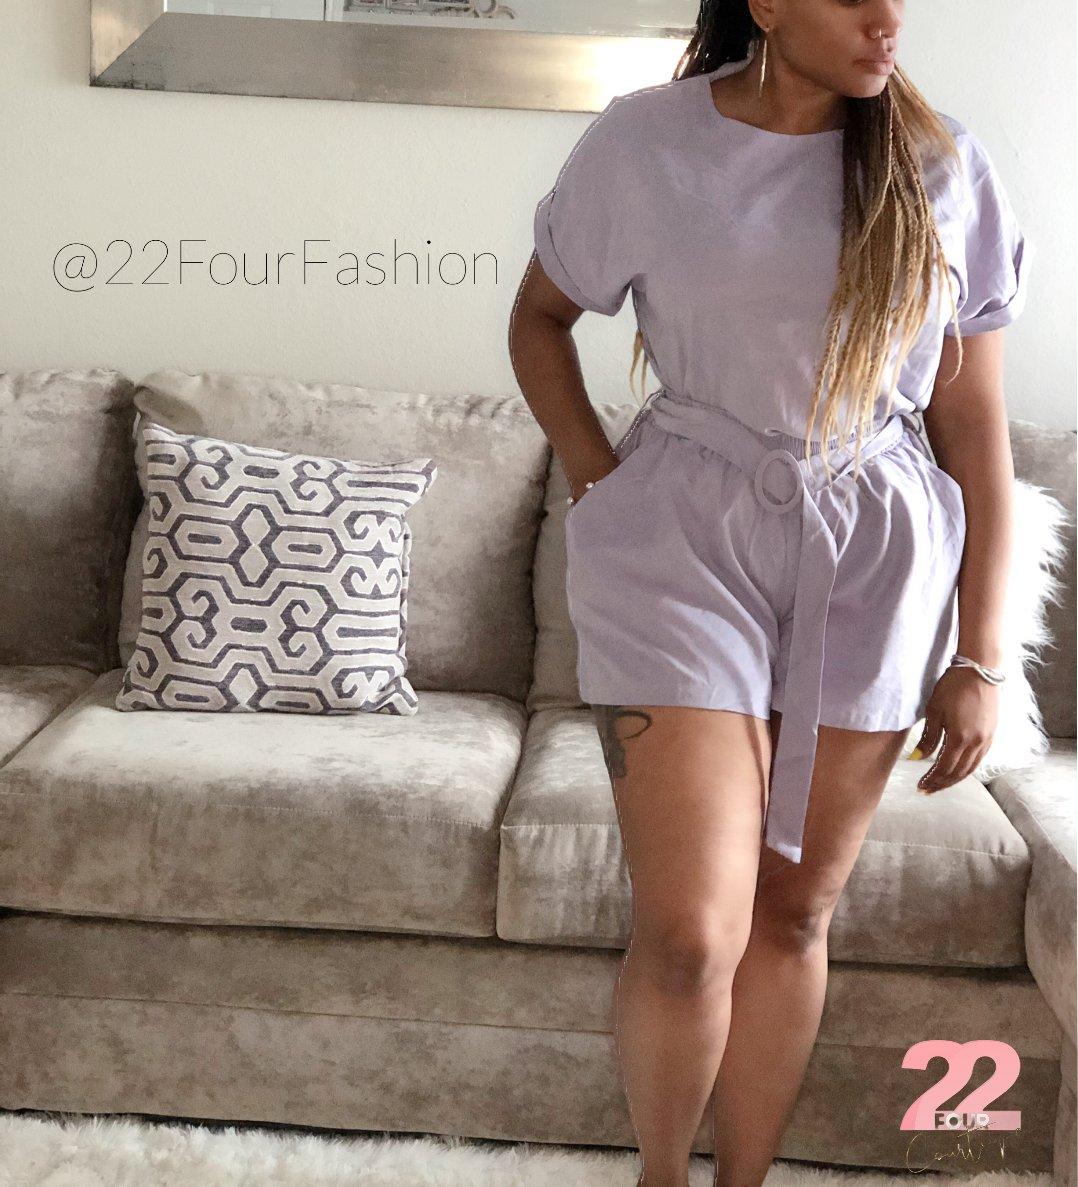 ᴸᴬᵛᴱᴺᴰᴱᴿ ᴸᴬᴰᵞ?  【 ↘ 🛍  🛍 ↙ 】 . . . .  【 #fathersday #fashion #22fourfab #dfw 】  【 #nola #bossbabes #spring #ootd 】  【  #instafashion #womenempowerment 】  【 #beautiful #explorepage #follow #style 】   【 #Dallasboutique …